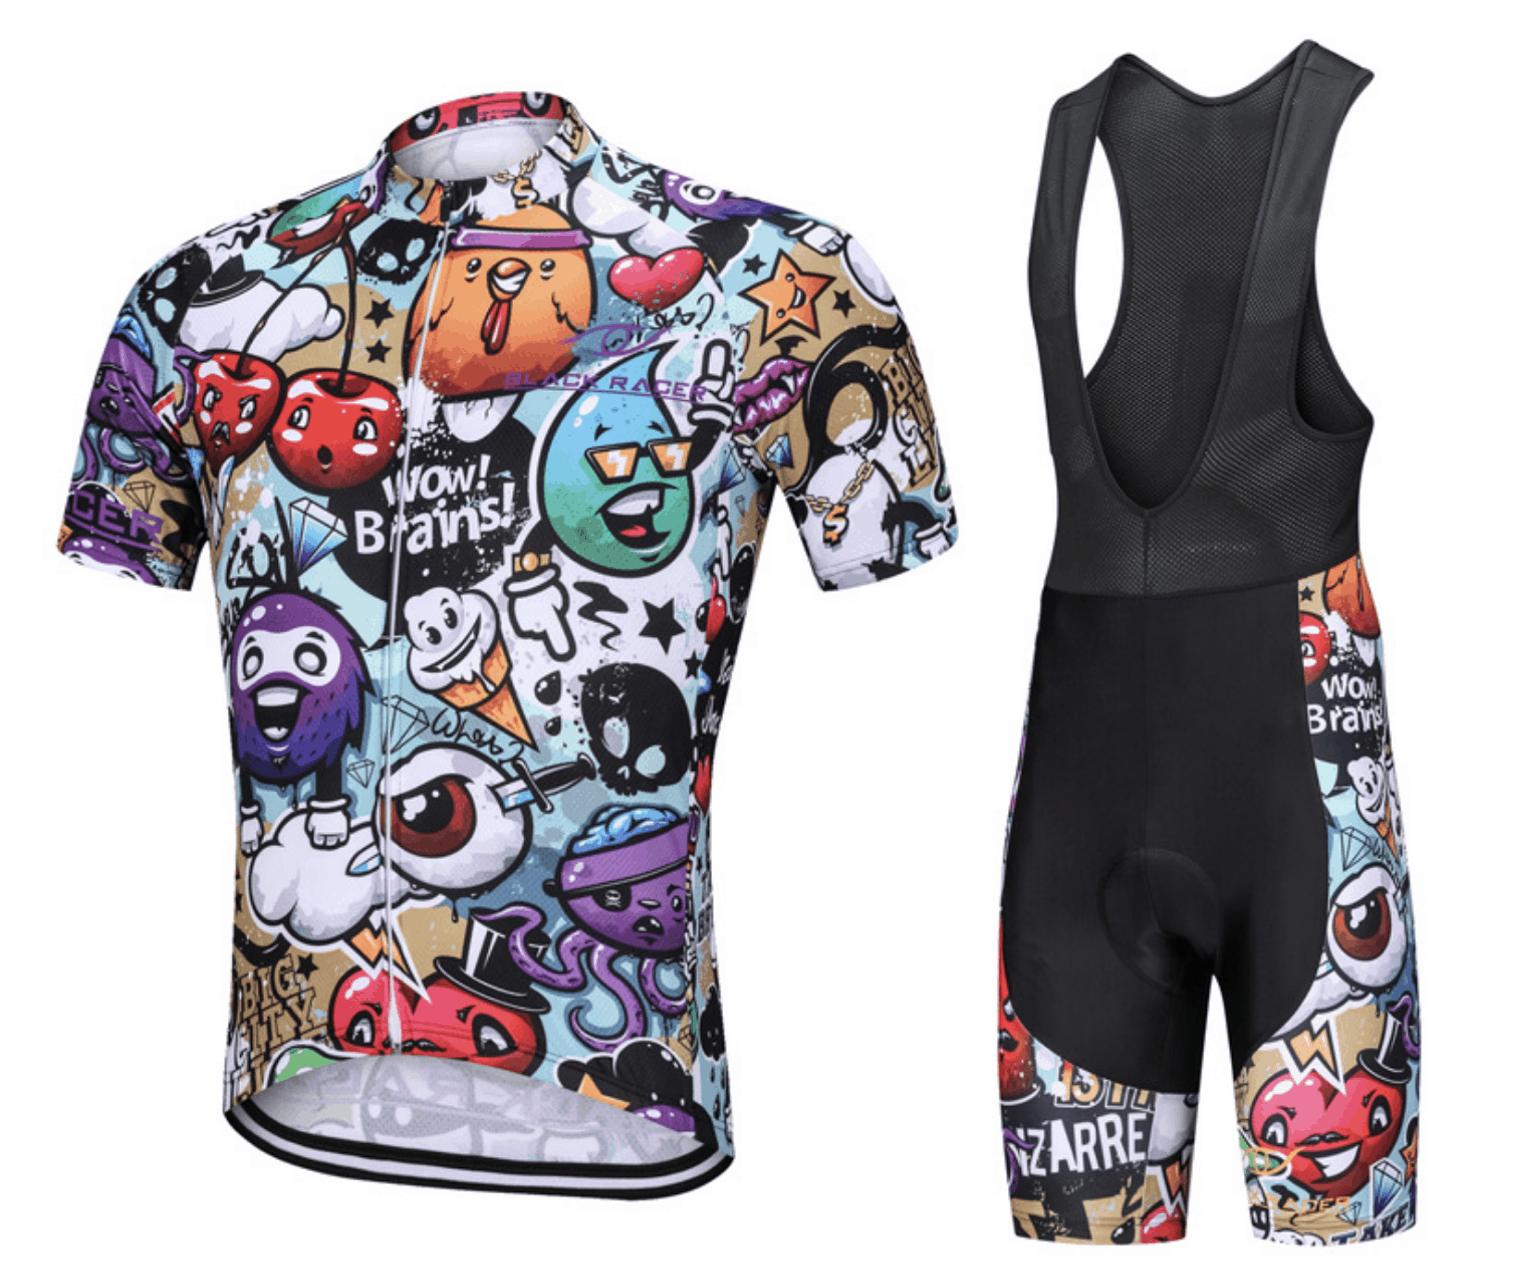 Black Racer Short Sleeve Cycling Shirt Set